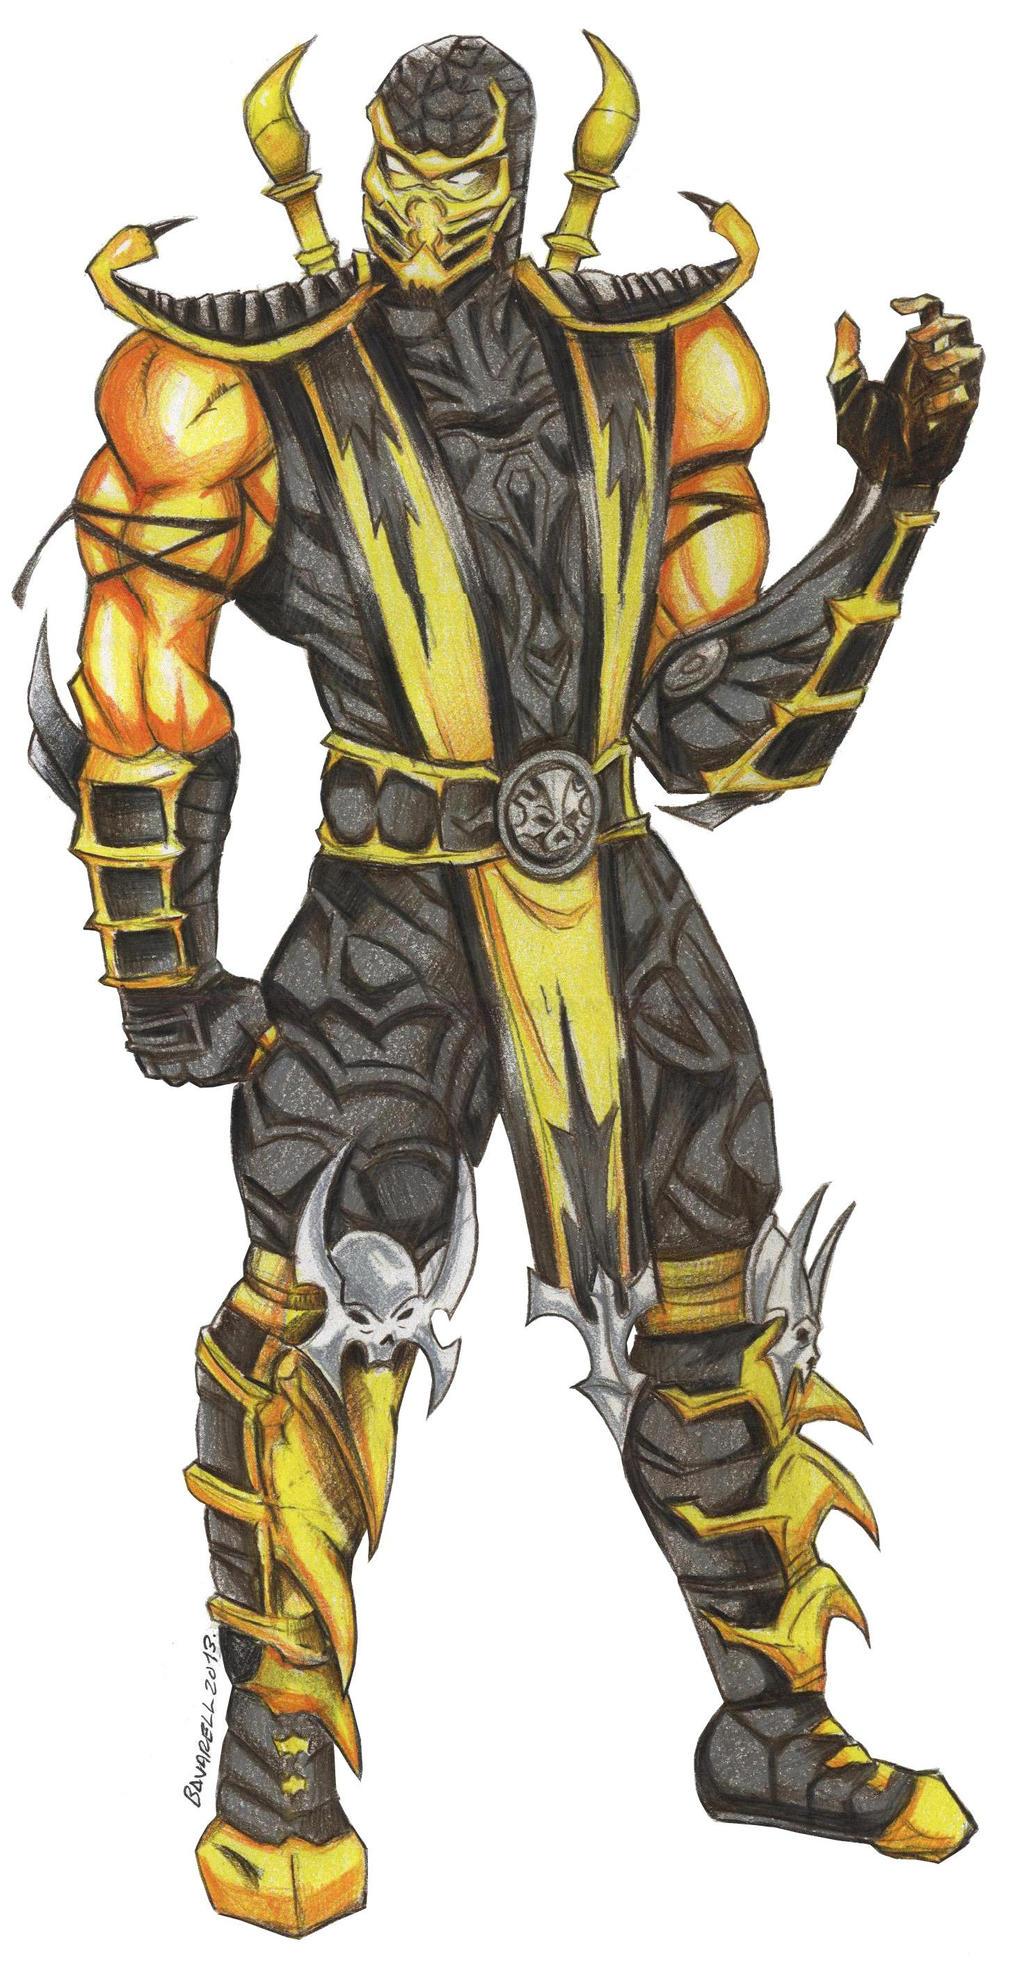 Scorpion Mortal Kombat 9 Jey Albert BR Comnission by ...